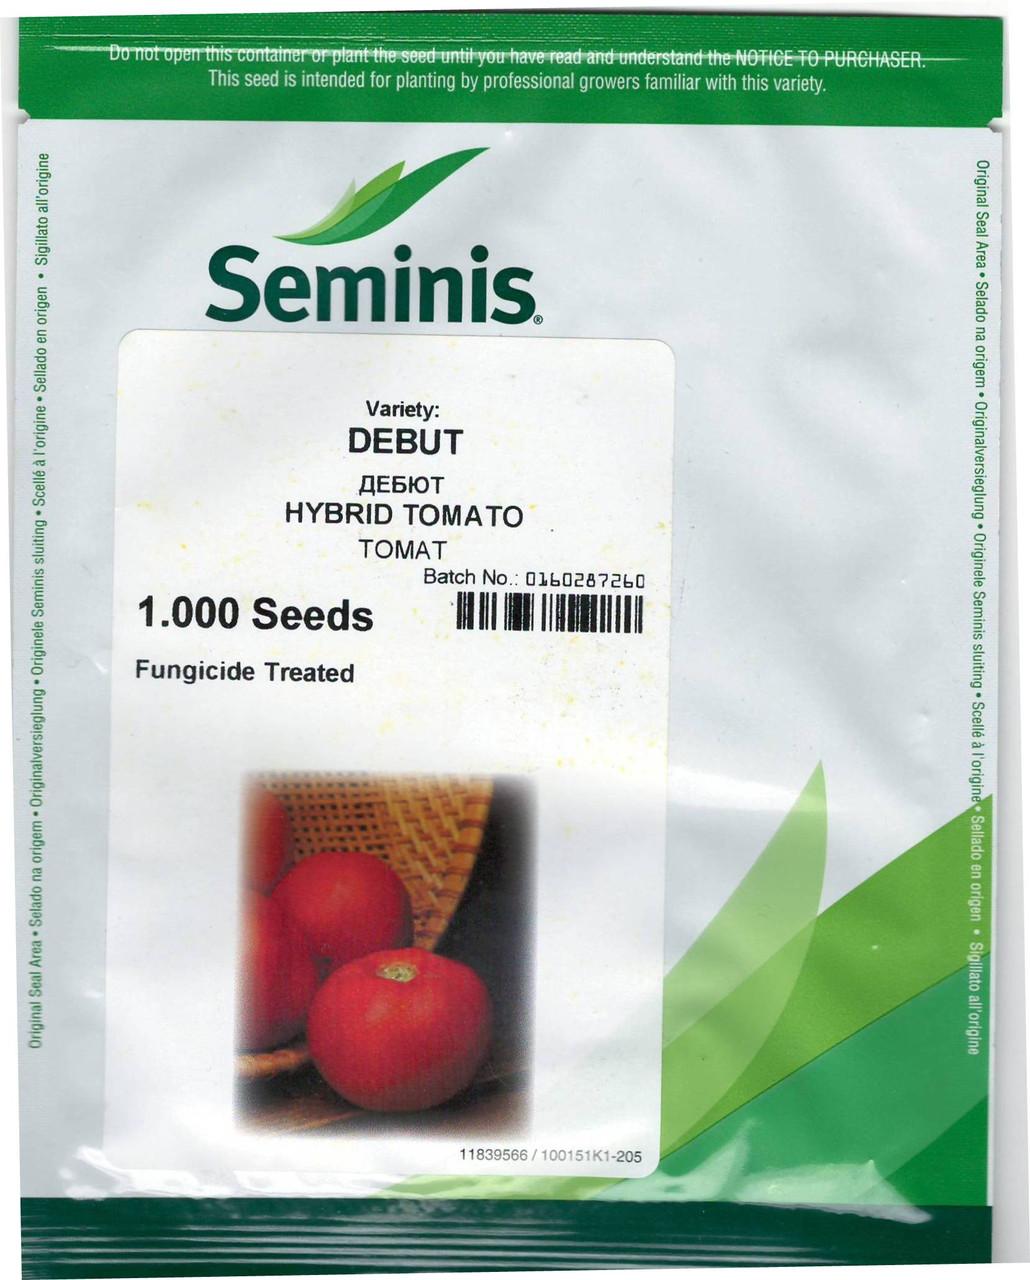 ДЕБЮТ F1 / DEBUT F1 - томат, Seminis 1000 cемян